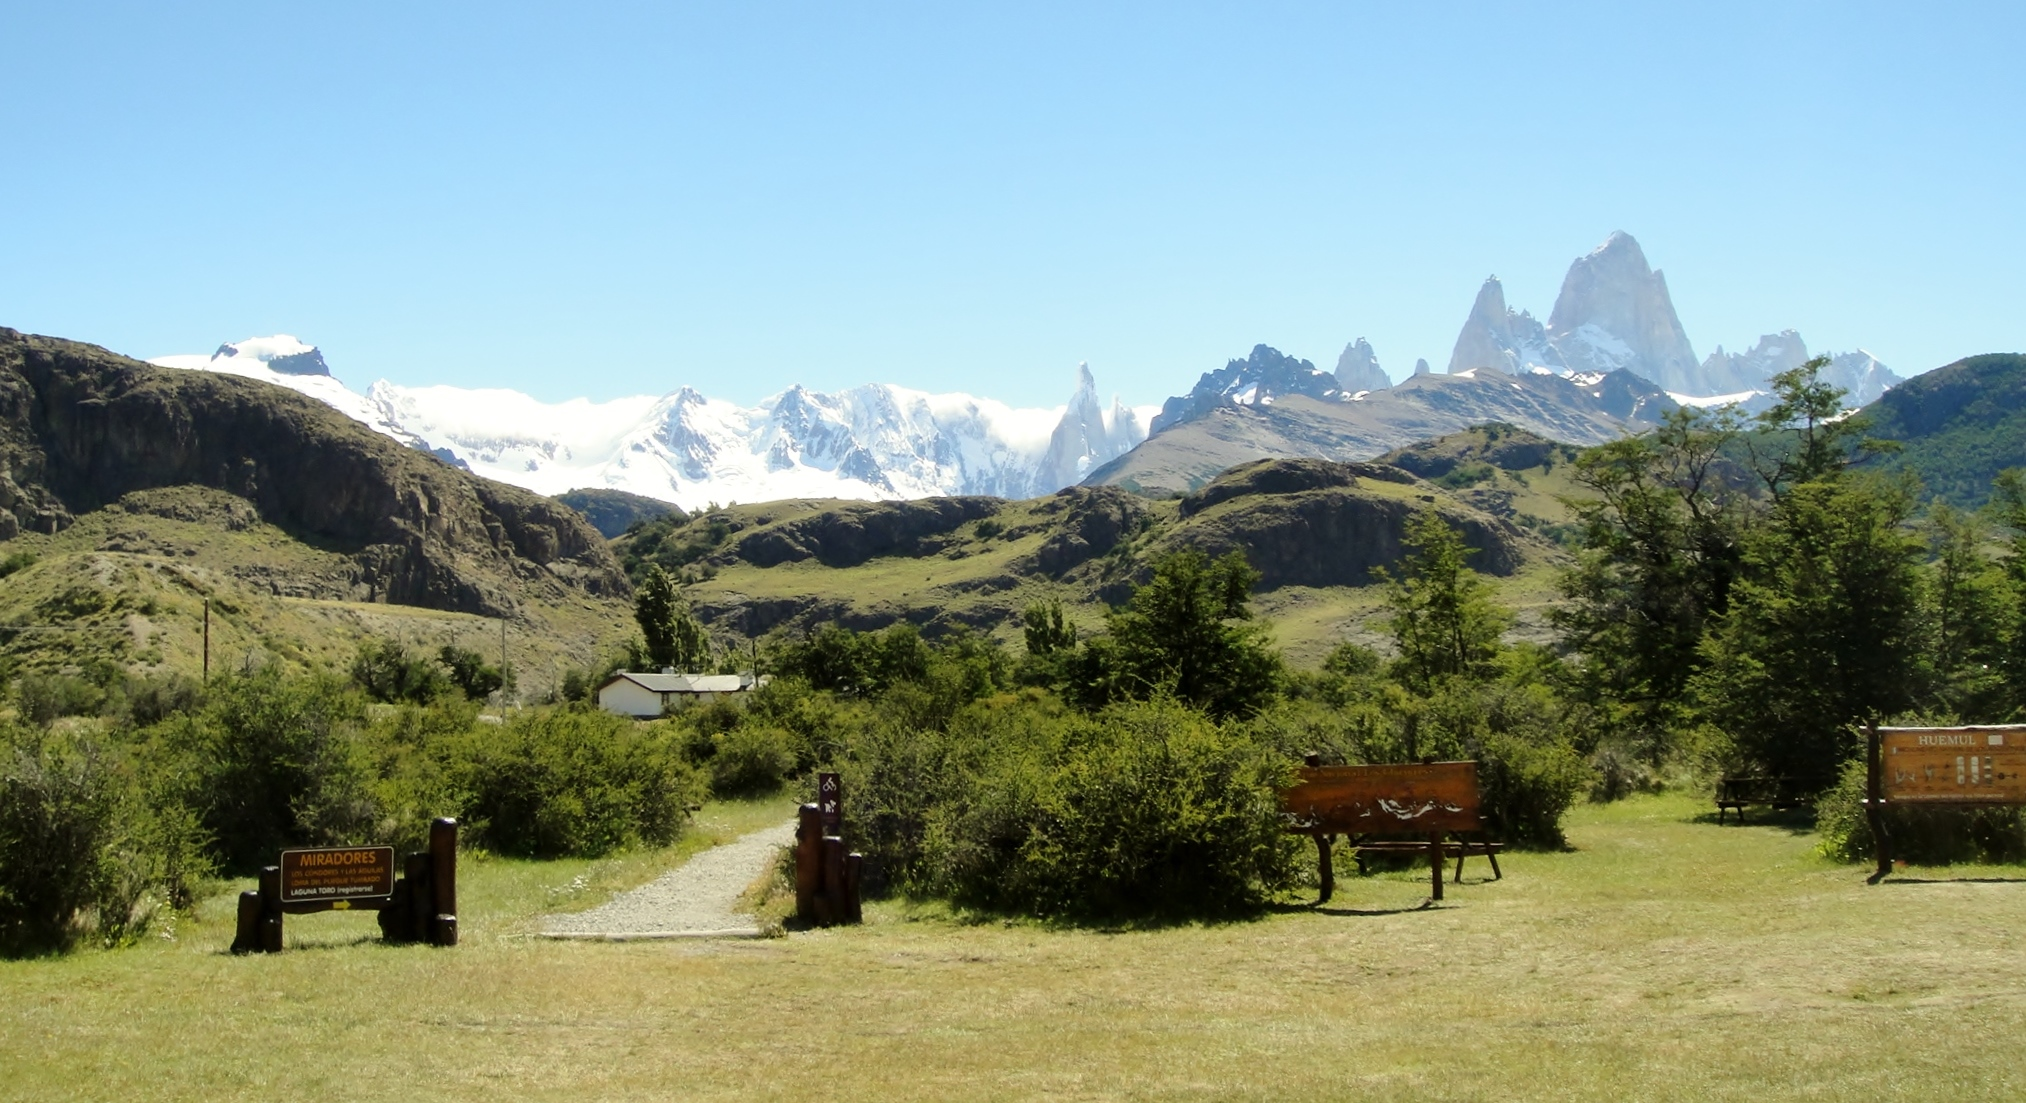 El Chalten – Hiking in Patagonia, Argentina